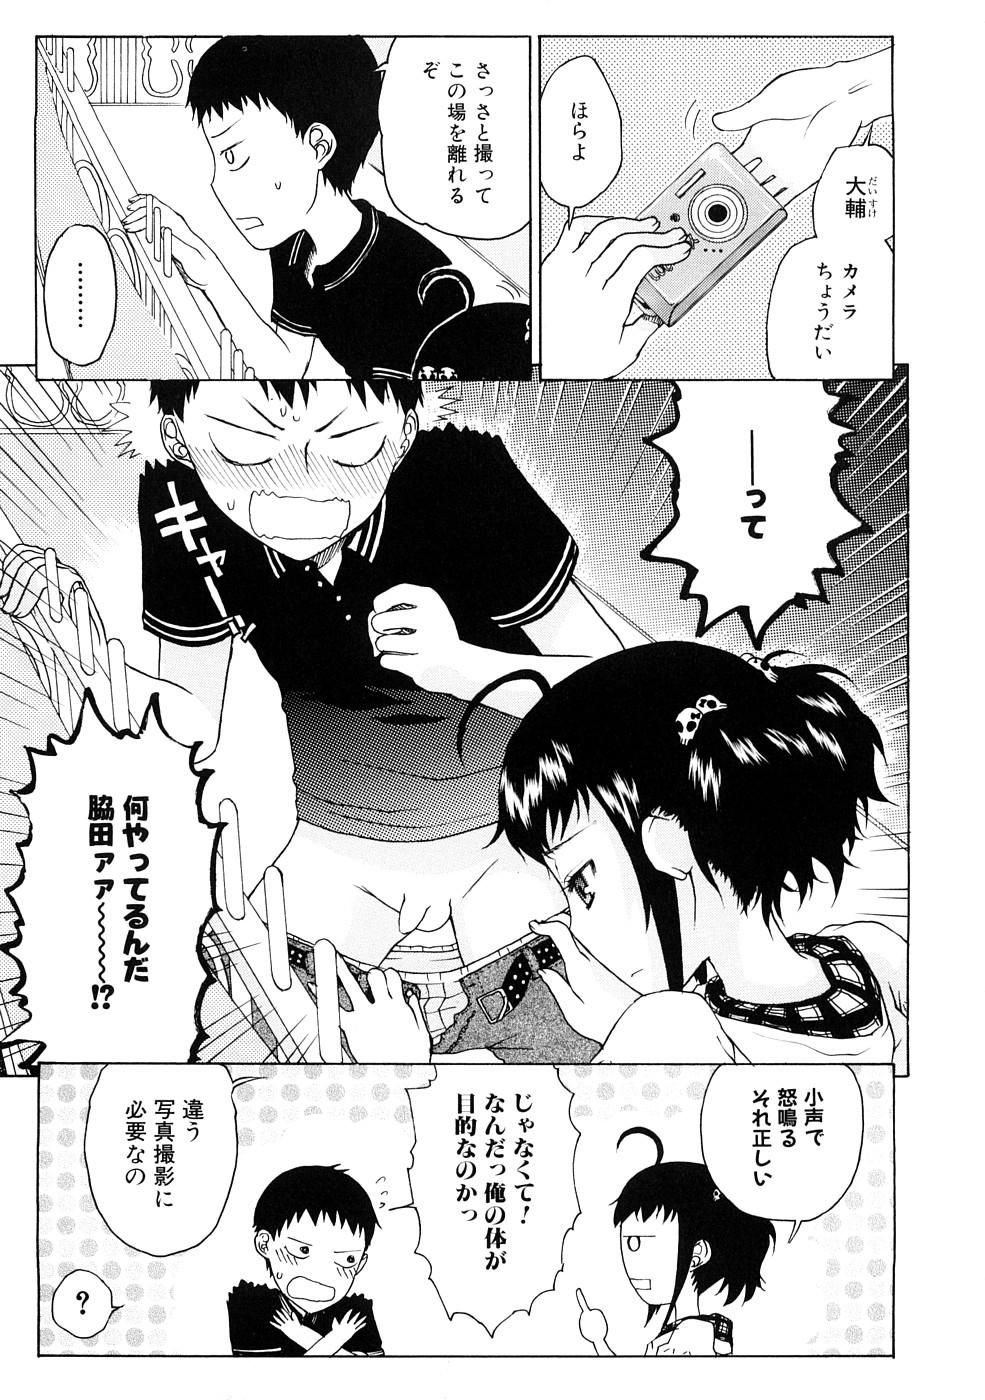 Ecchi de Jibunkatte de Kawaii Ko 22